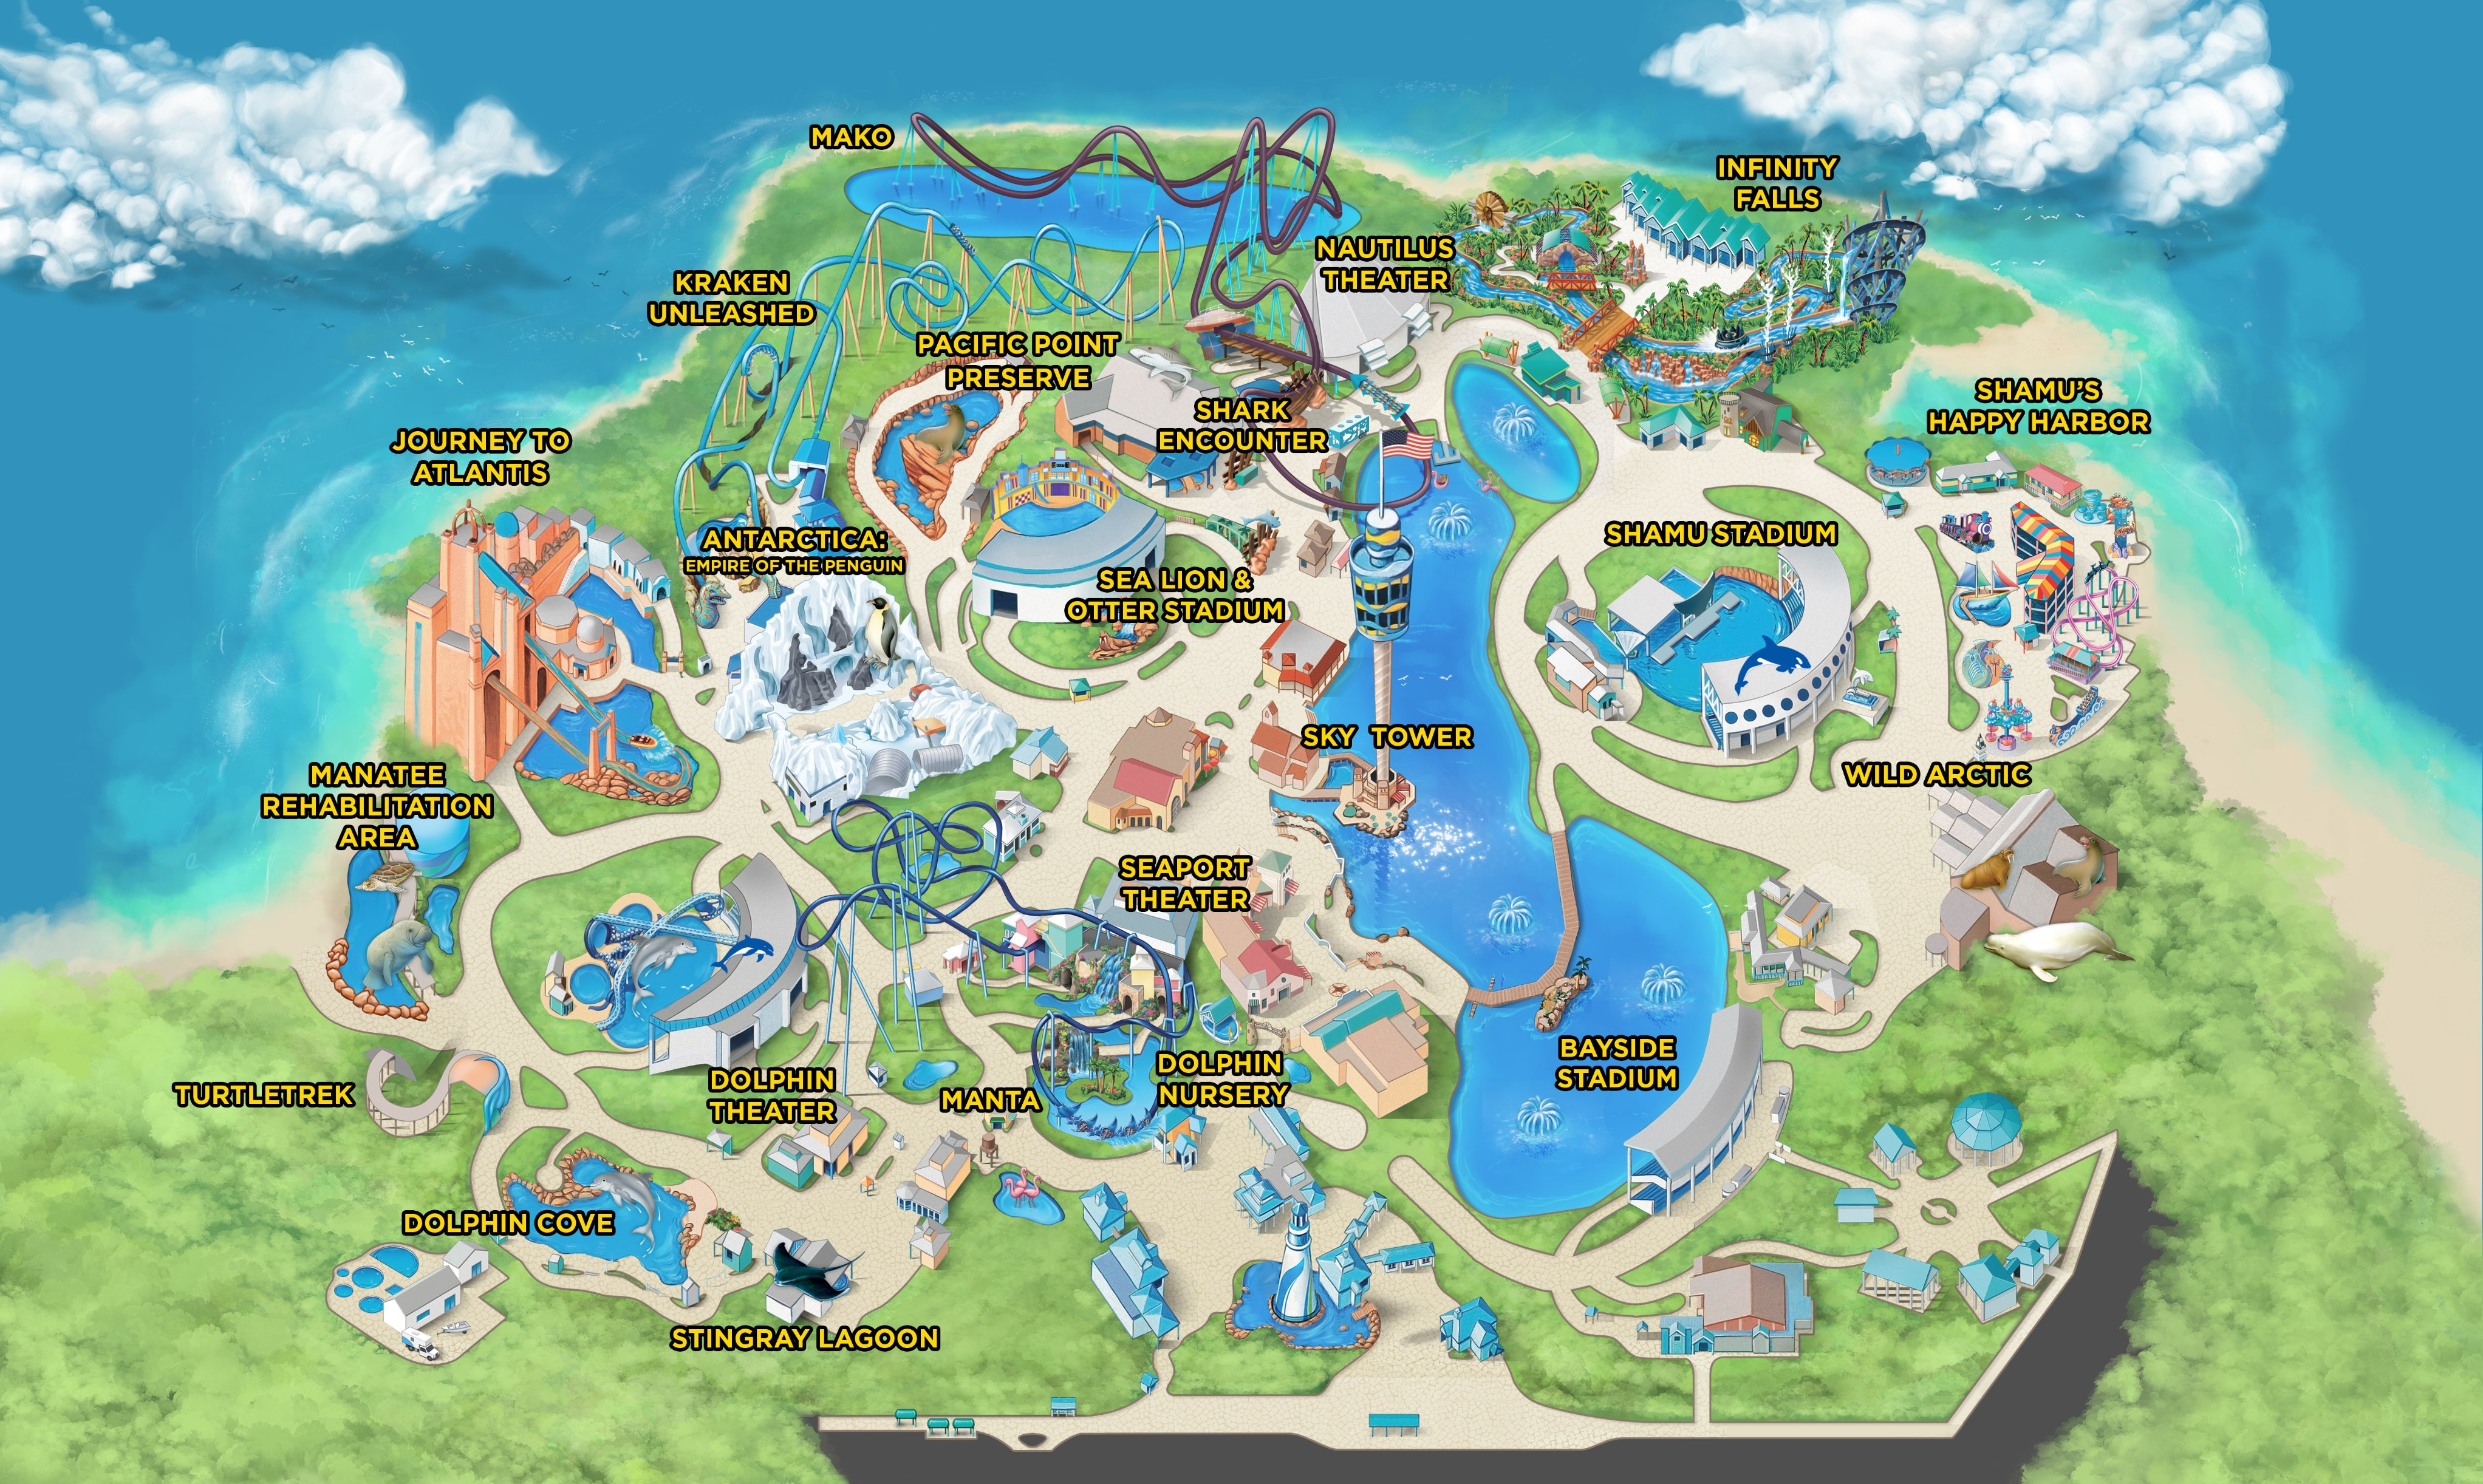 Seaworld Orlando | Seaworld Parks And Entertainment - Sea World Florida Map